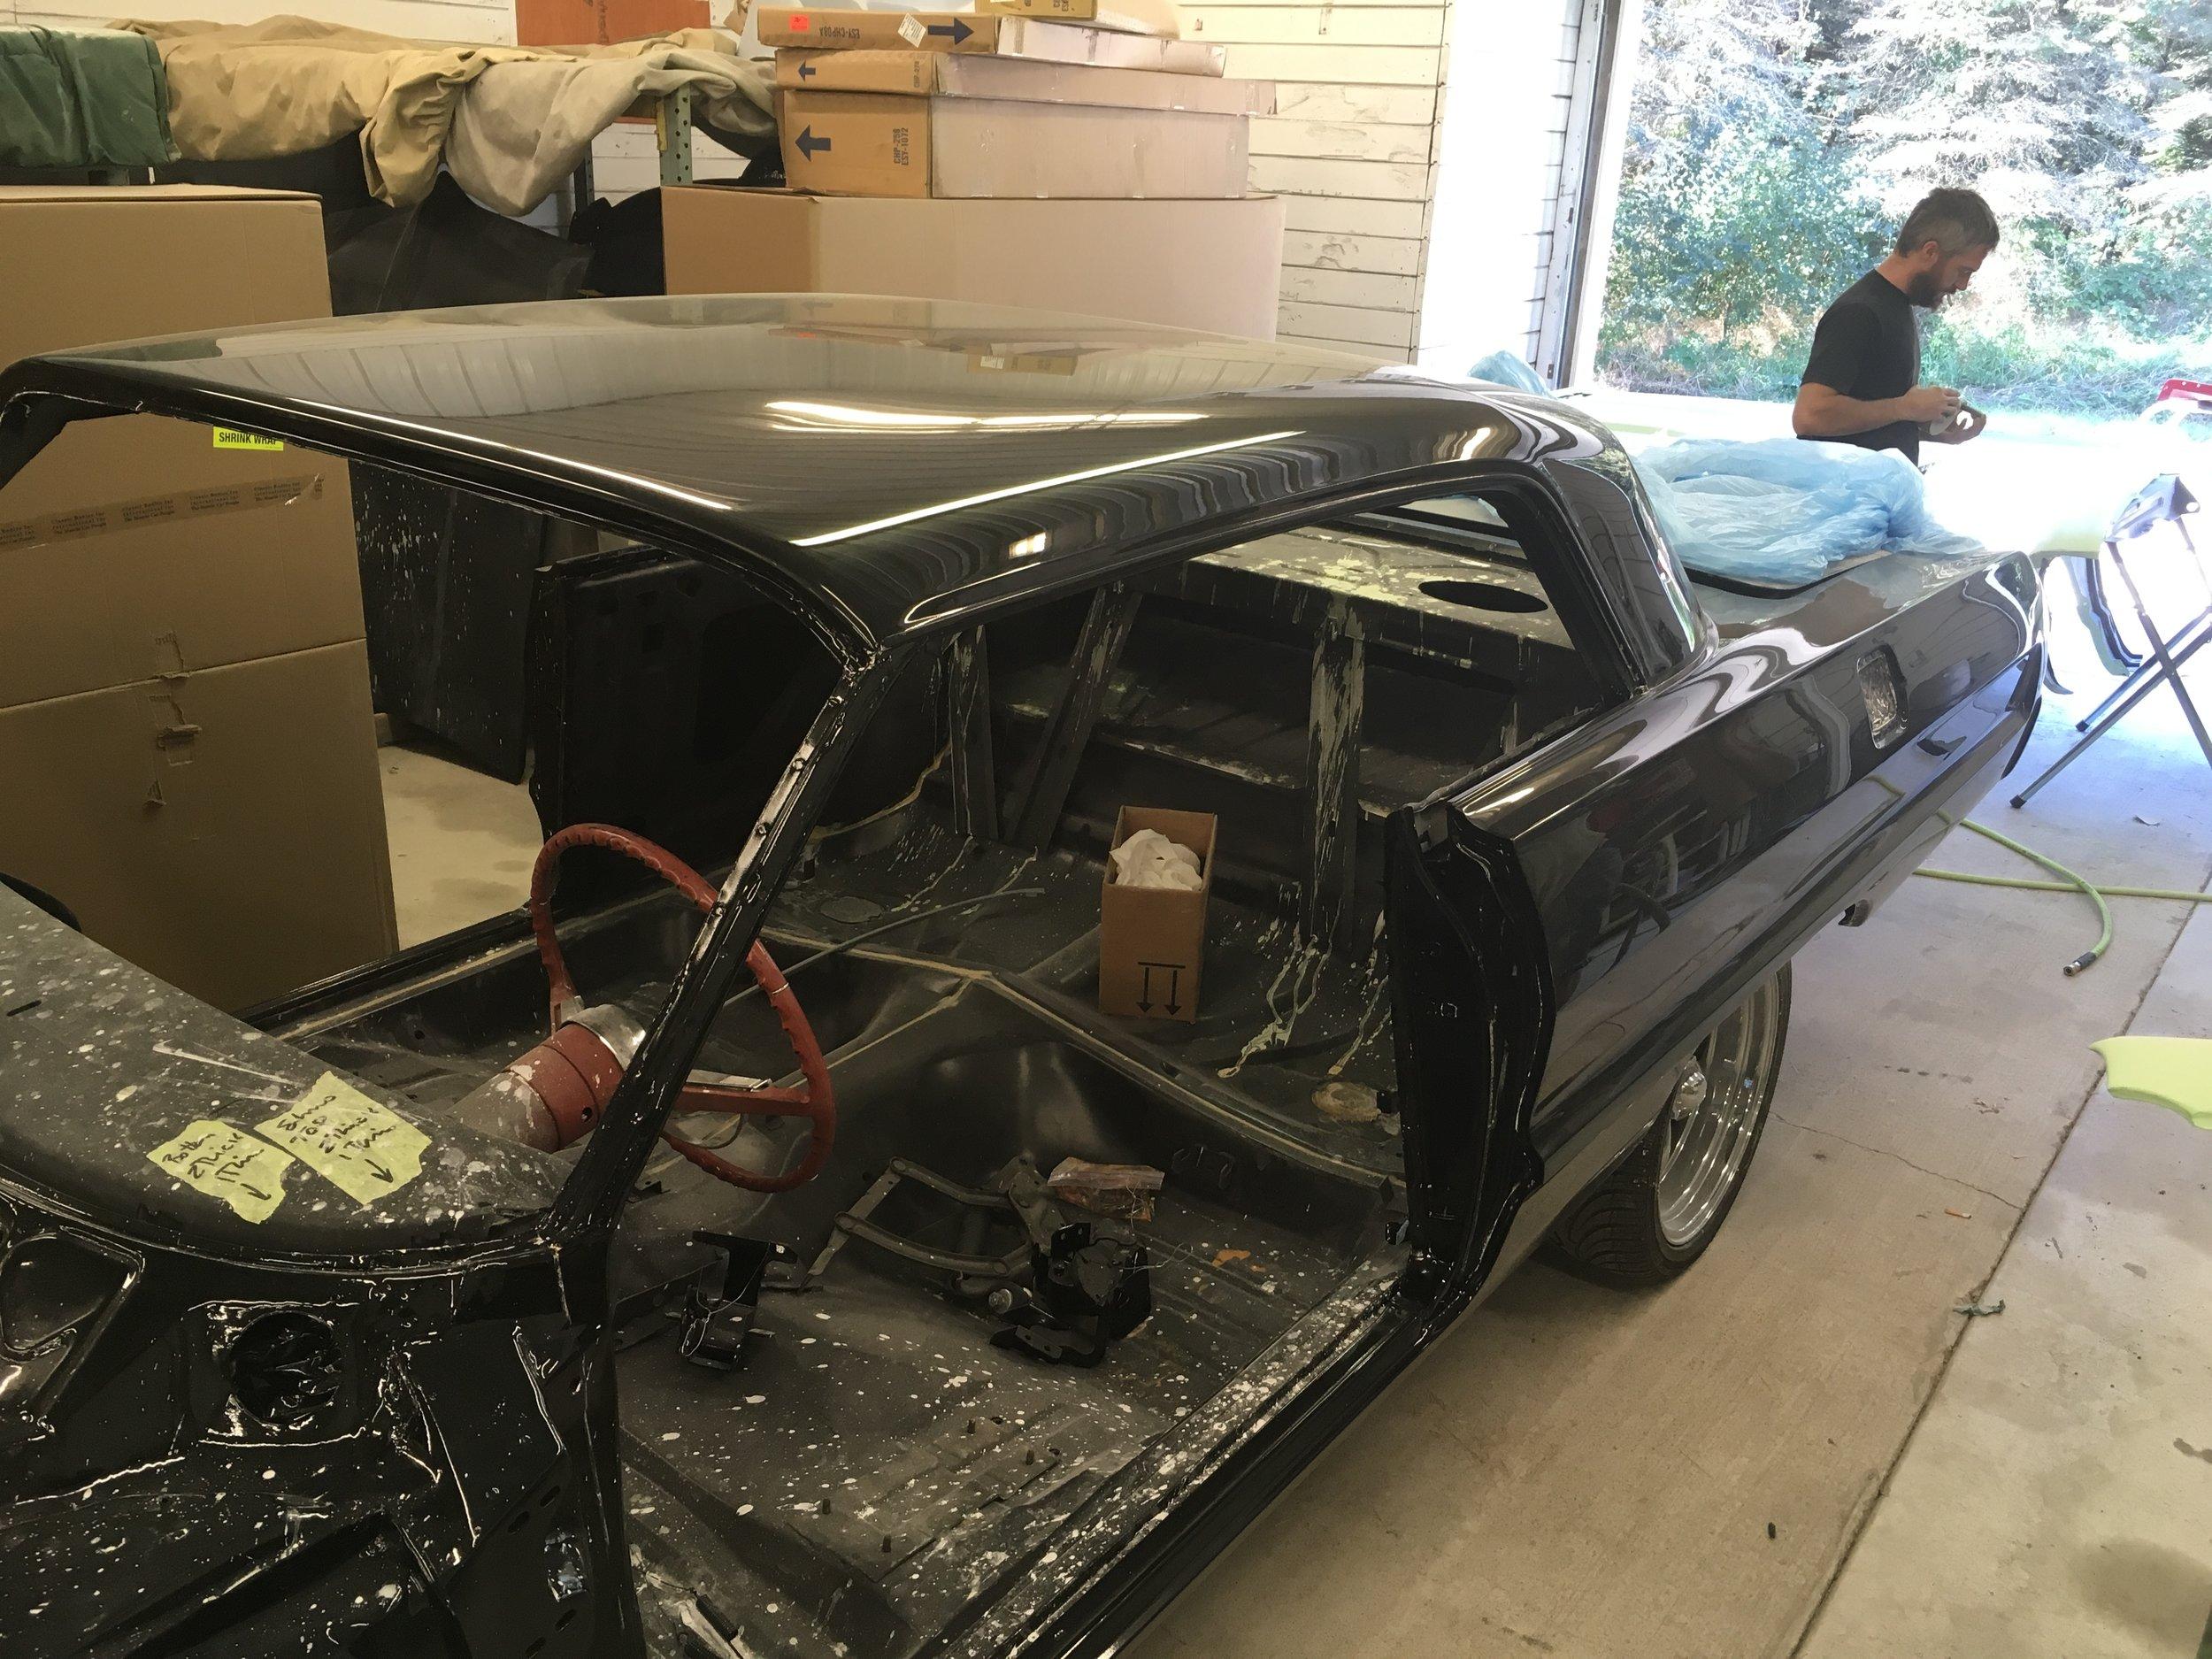 1964-Impala-SS-minneapolis-hot-rod-custom-built-restorations-14.jpg